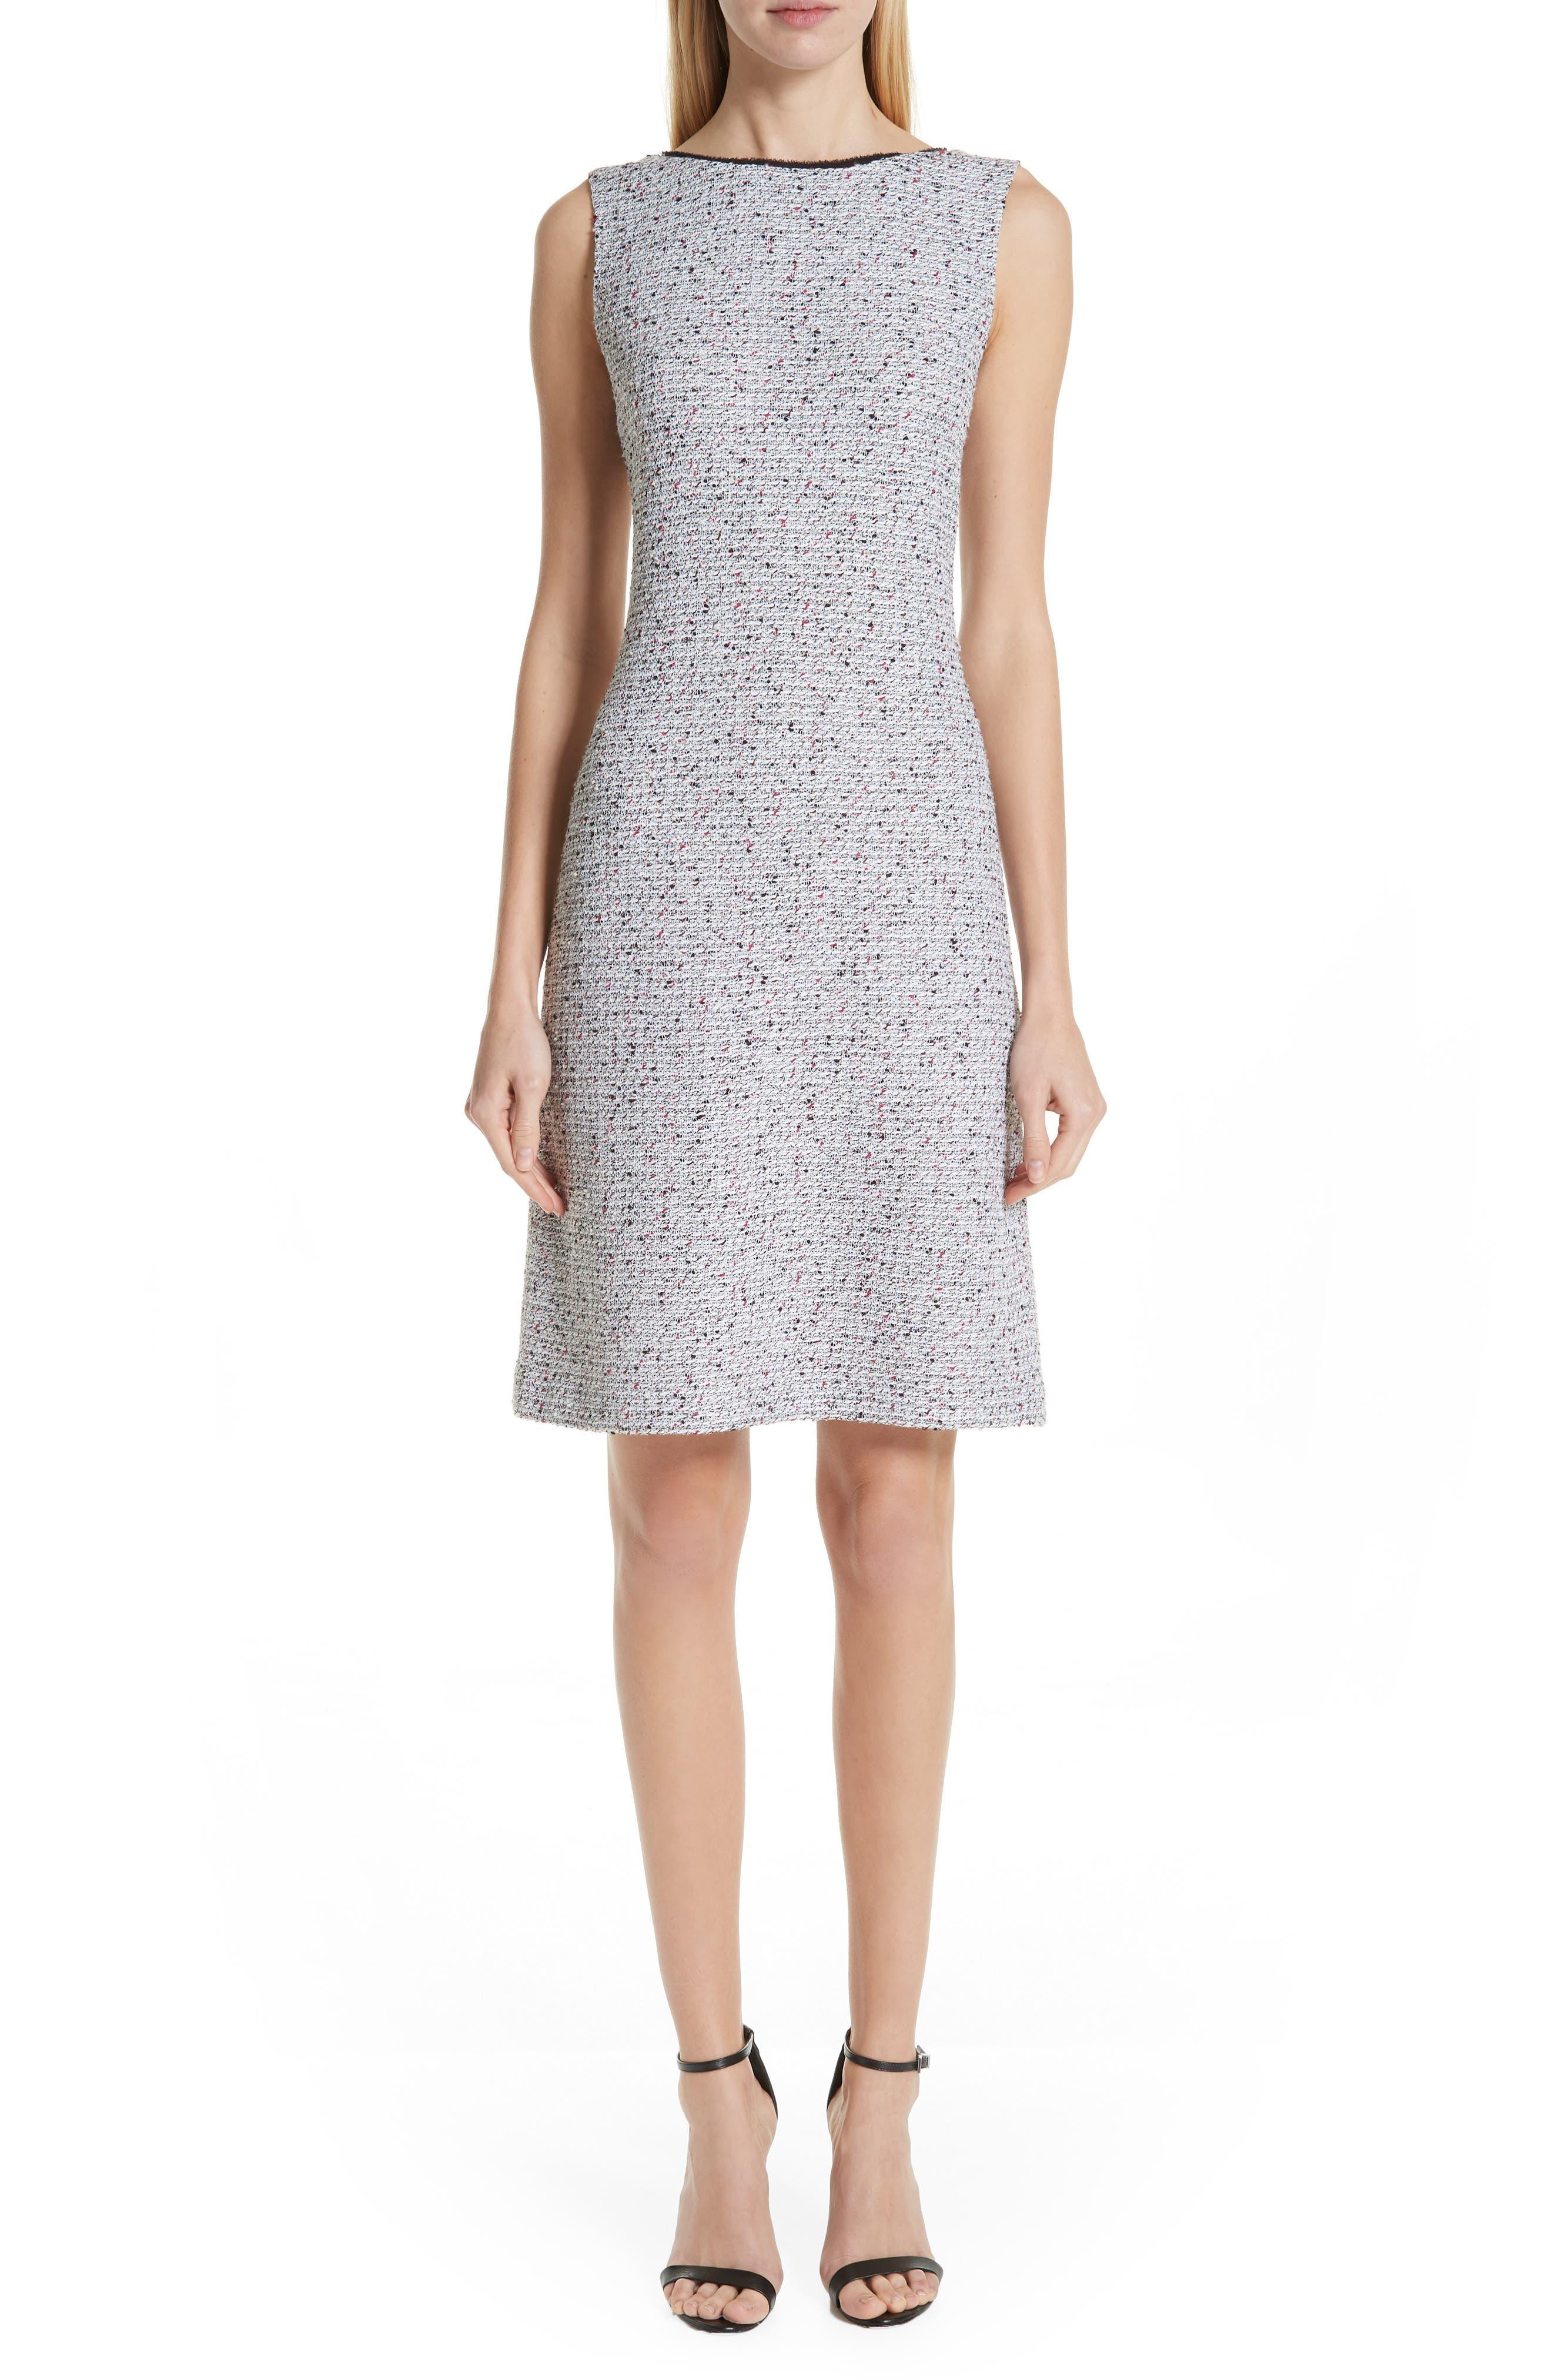 ST. JOHN COLLECTION Alicia Knit Sheath Dress, Main, color, WHITE/ FLAMINGO MULTI